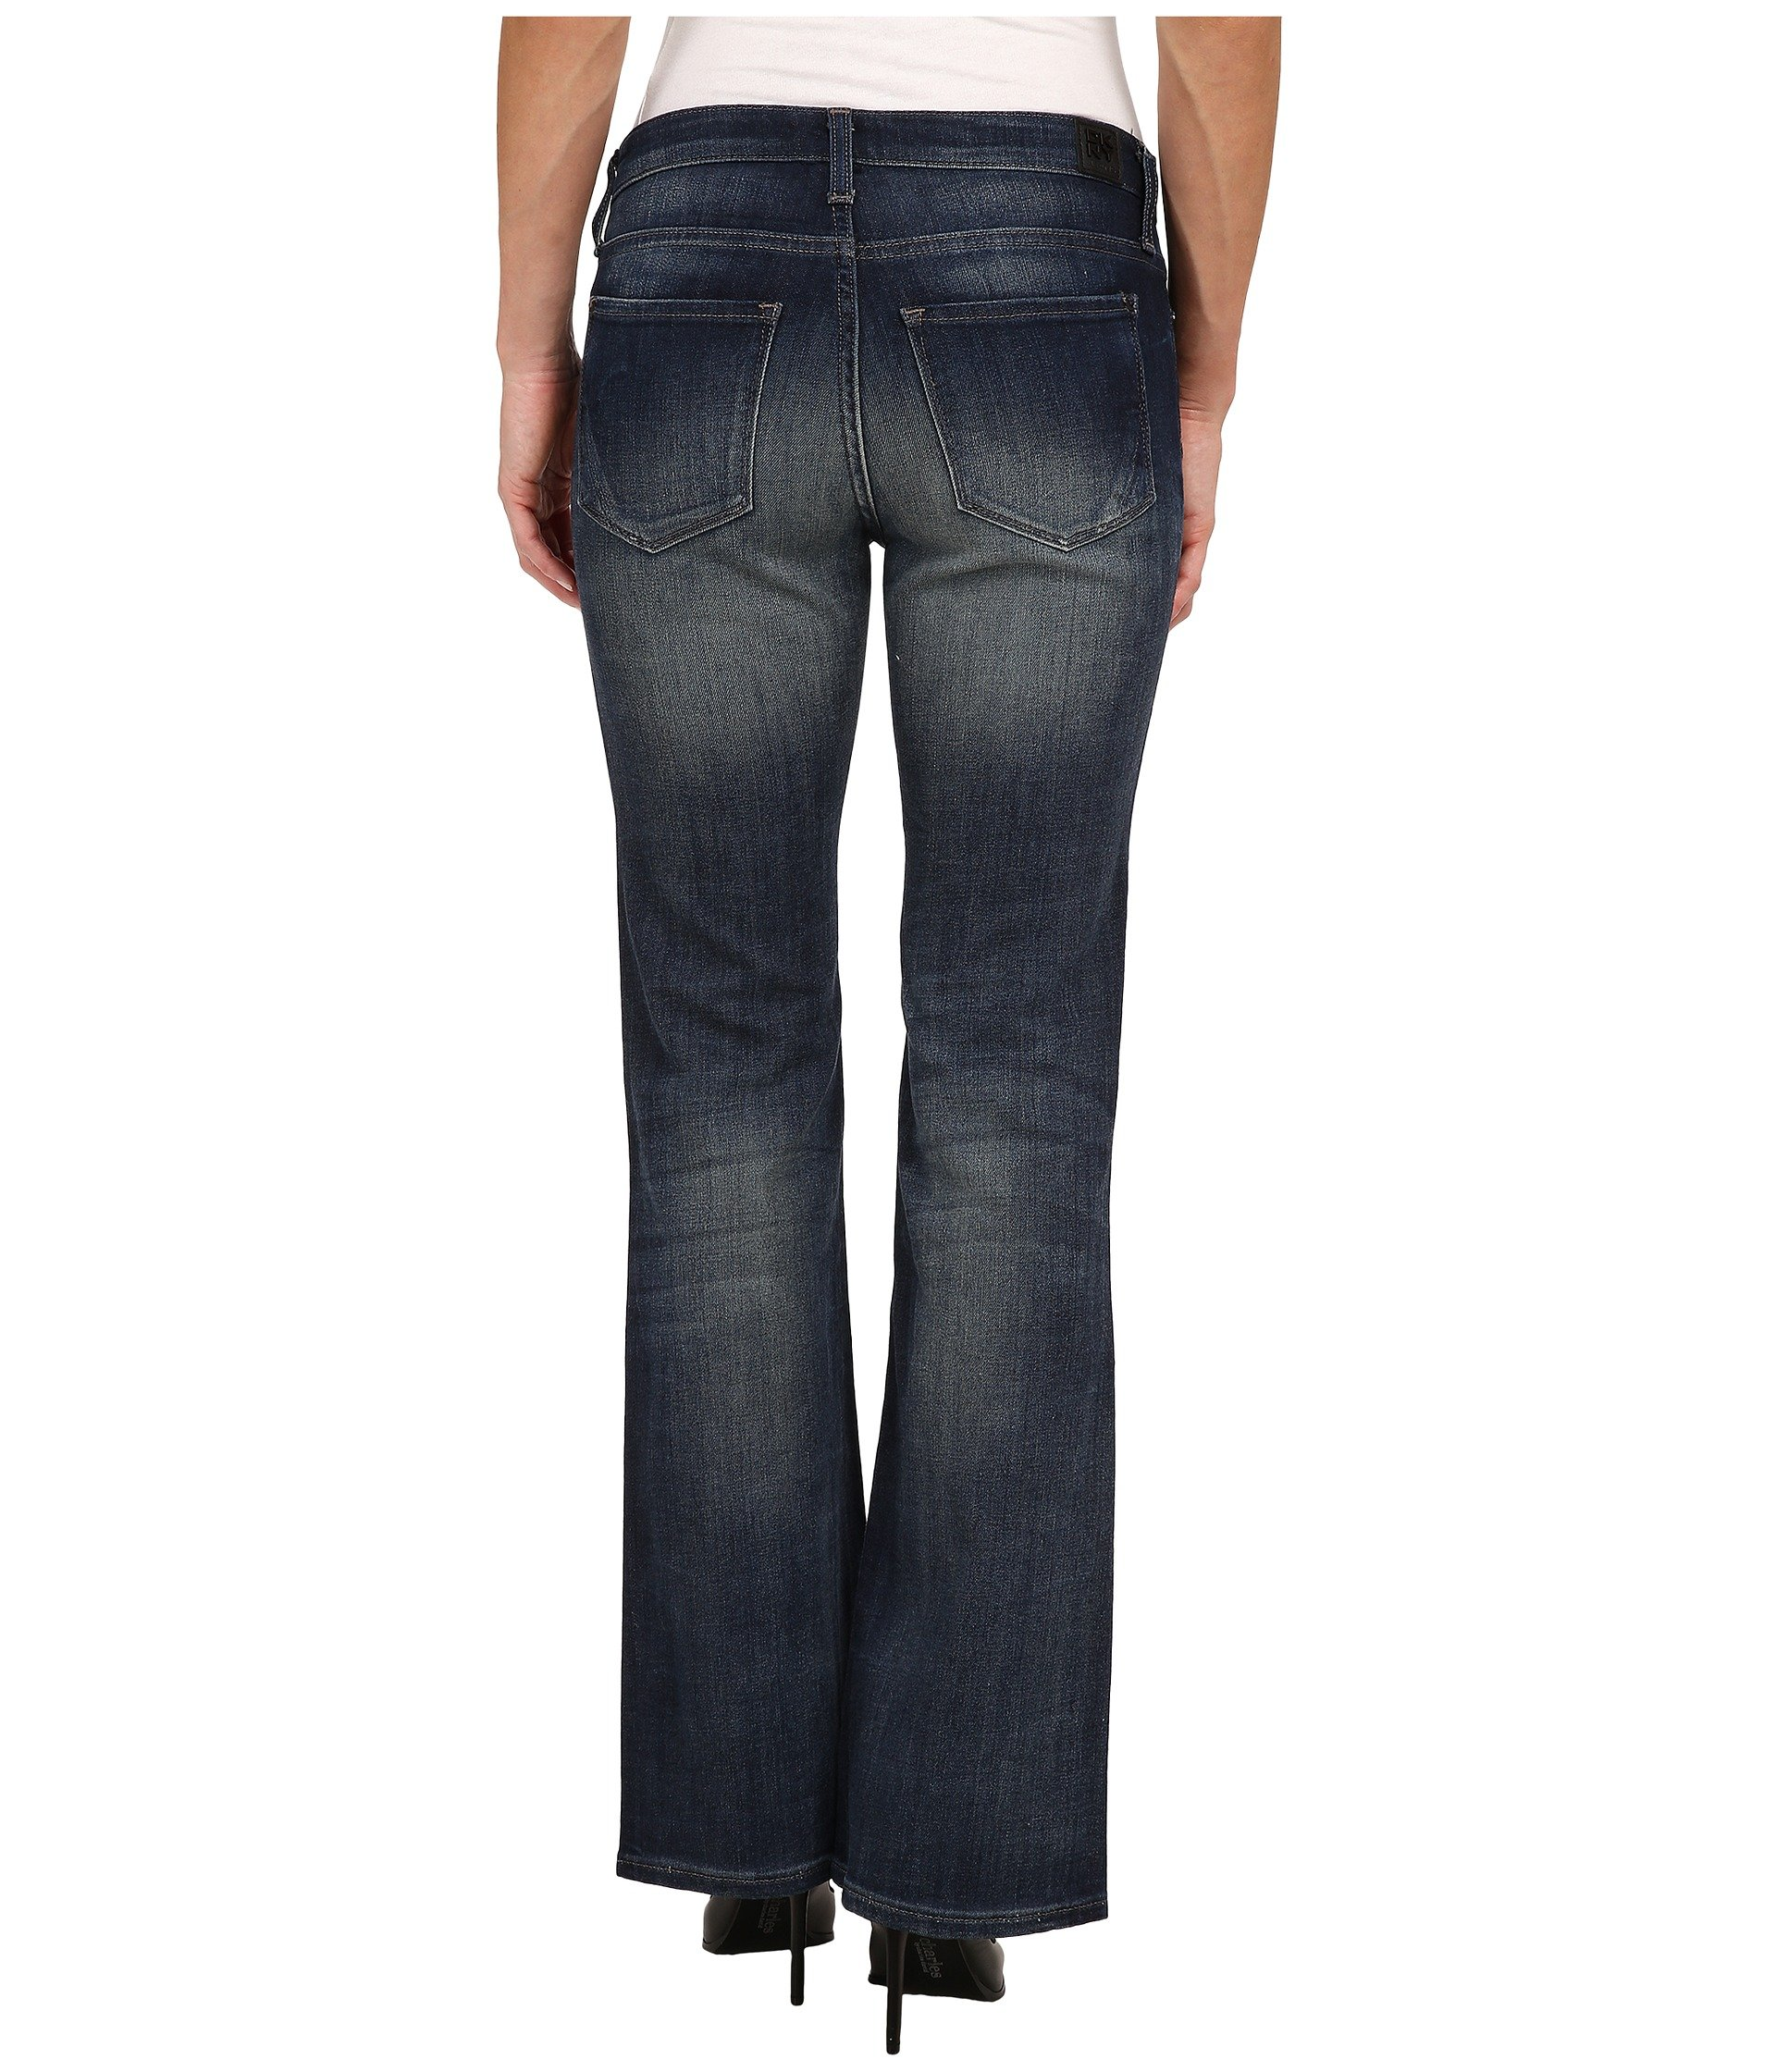 dkny jeans size chart